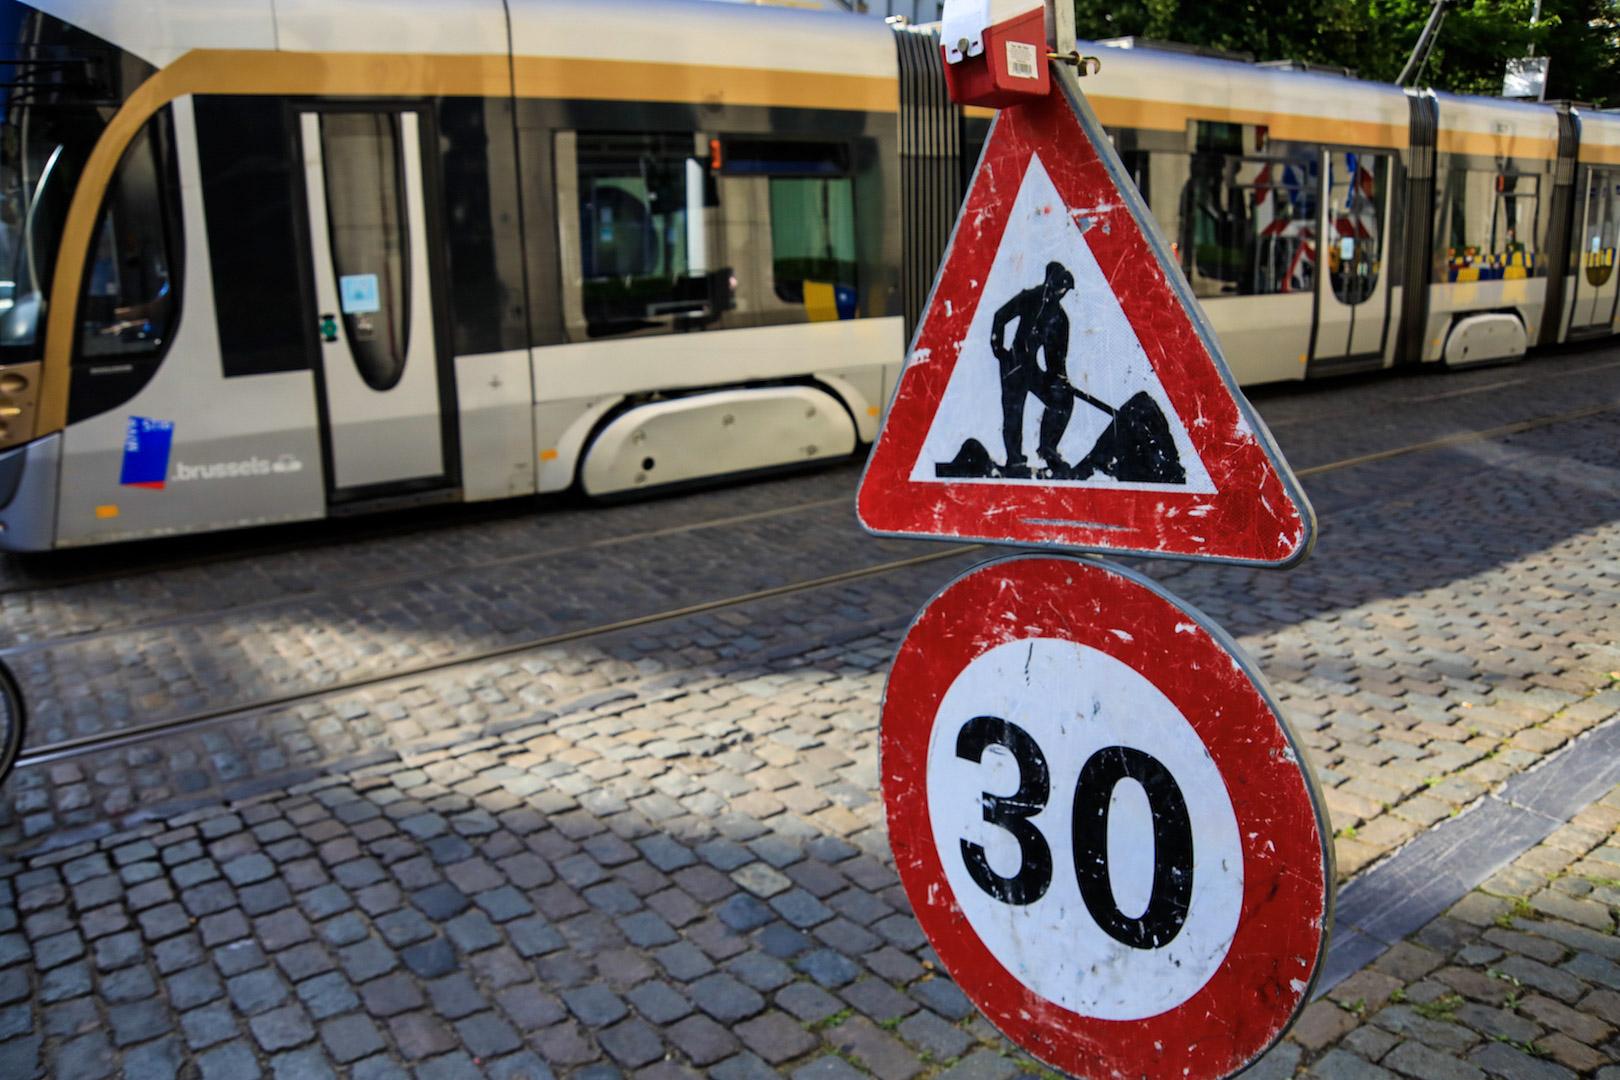 zone 30 sign road works traveaux tram stib